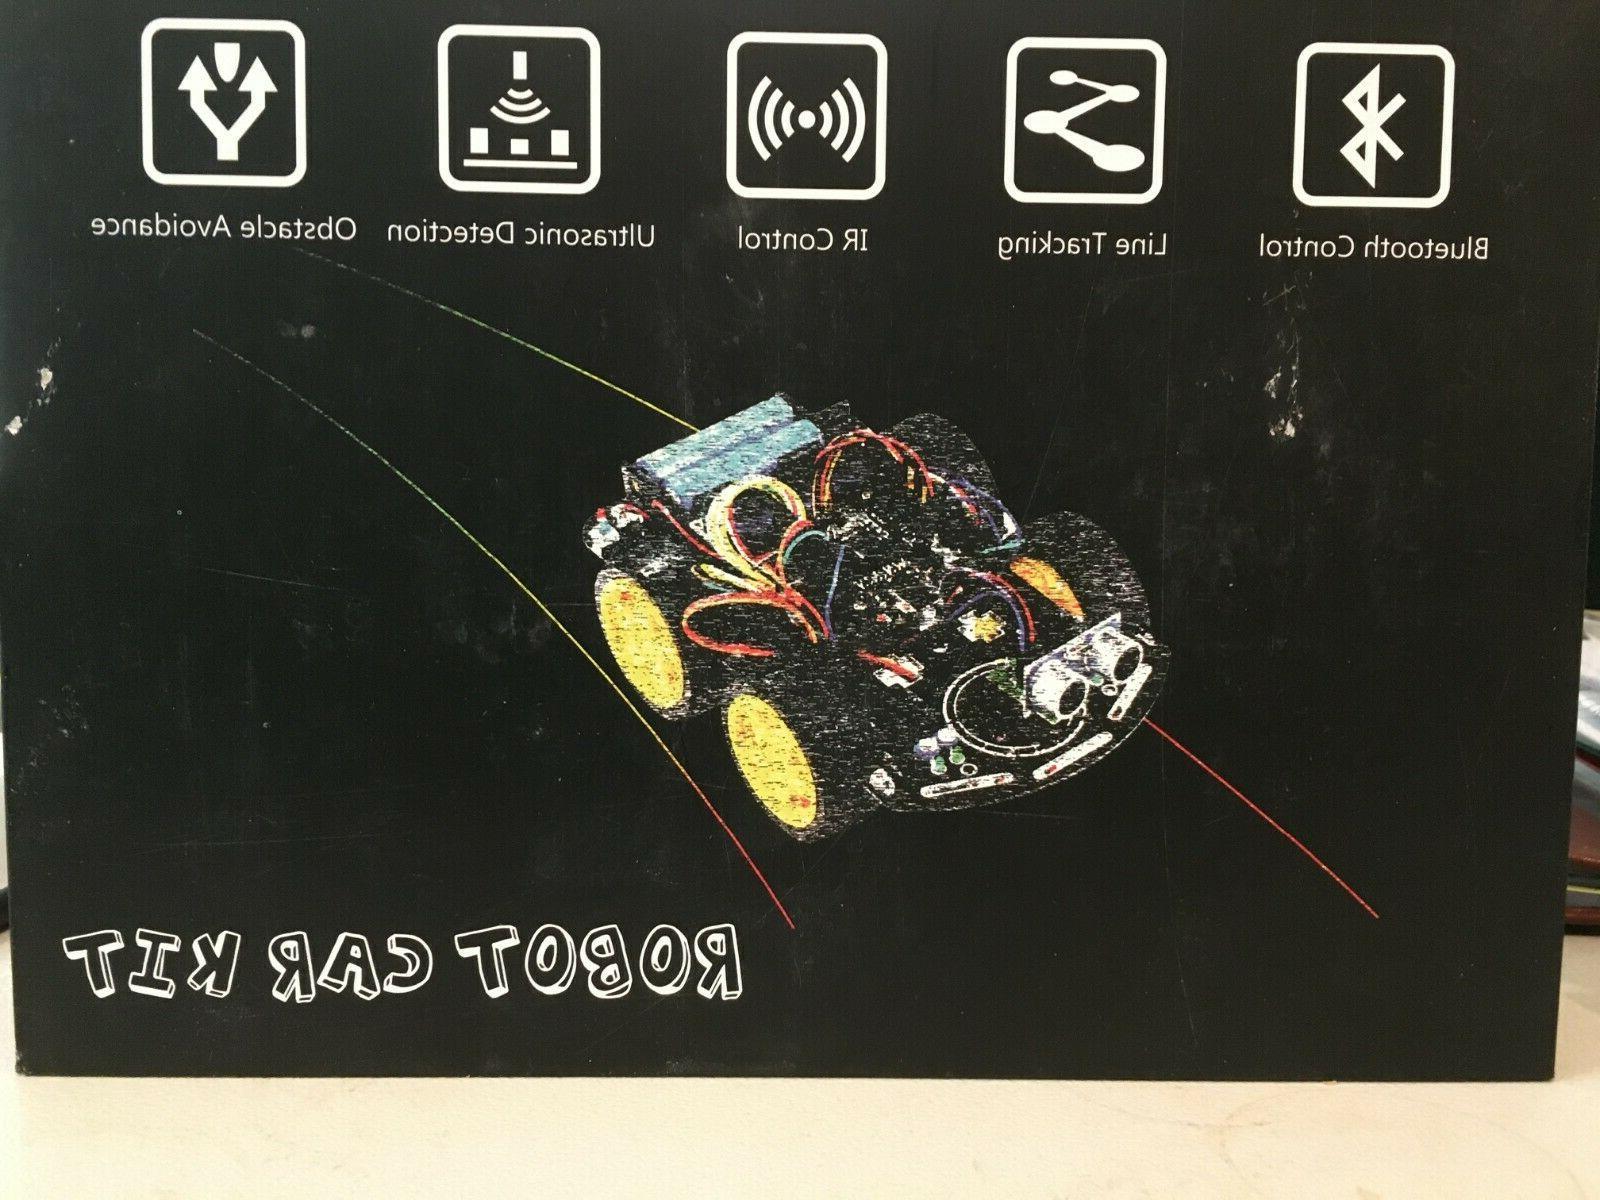 robot car kit electronics starter learning pack